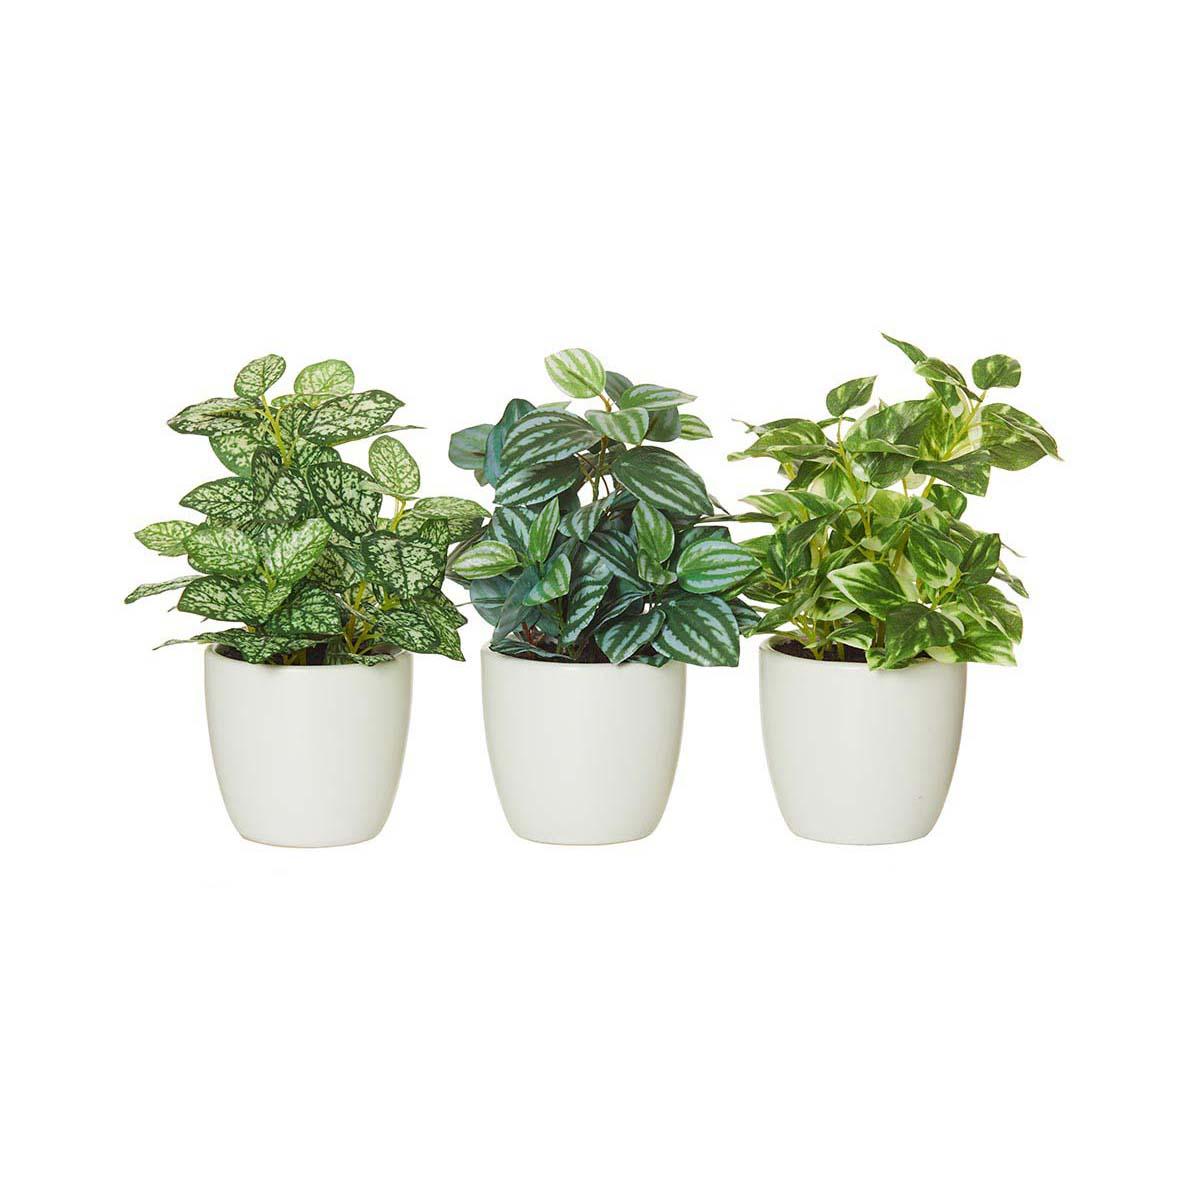 GARDEN PLANT POT SET OF 3 in white